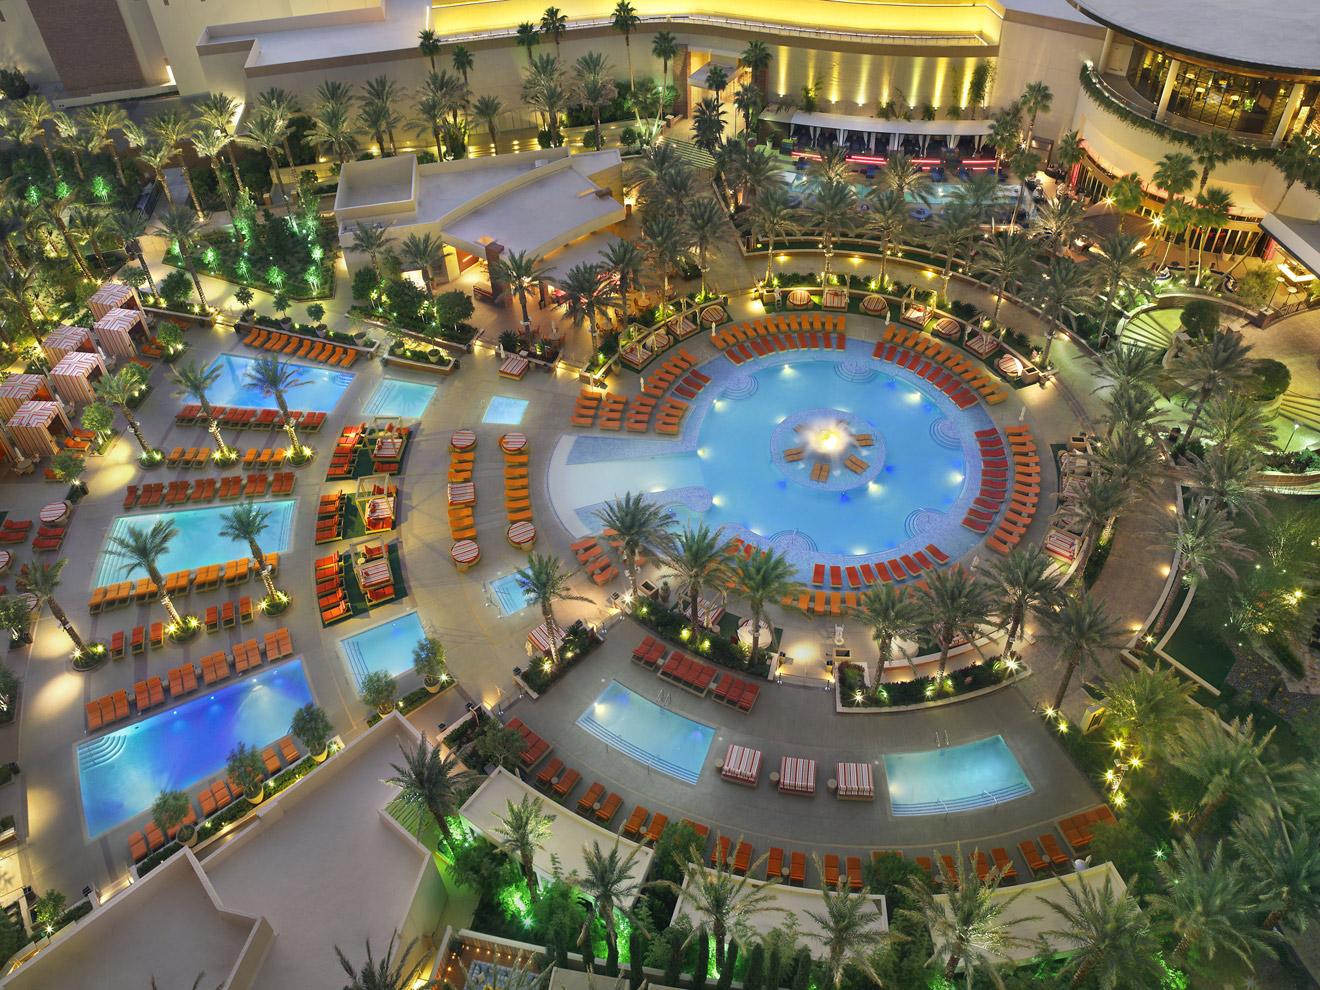 Red Rock Resort Backyard Pool